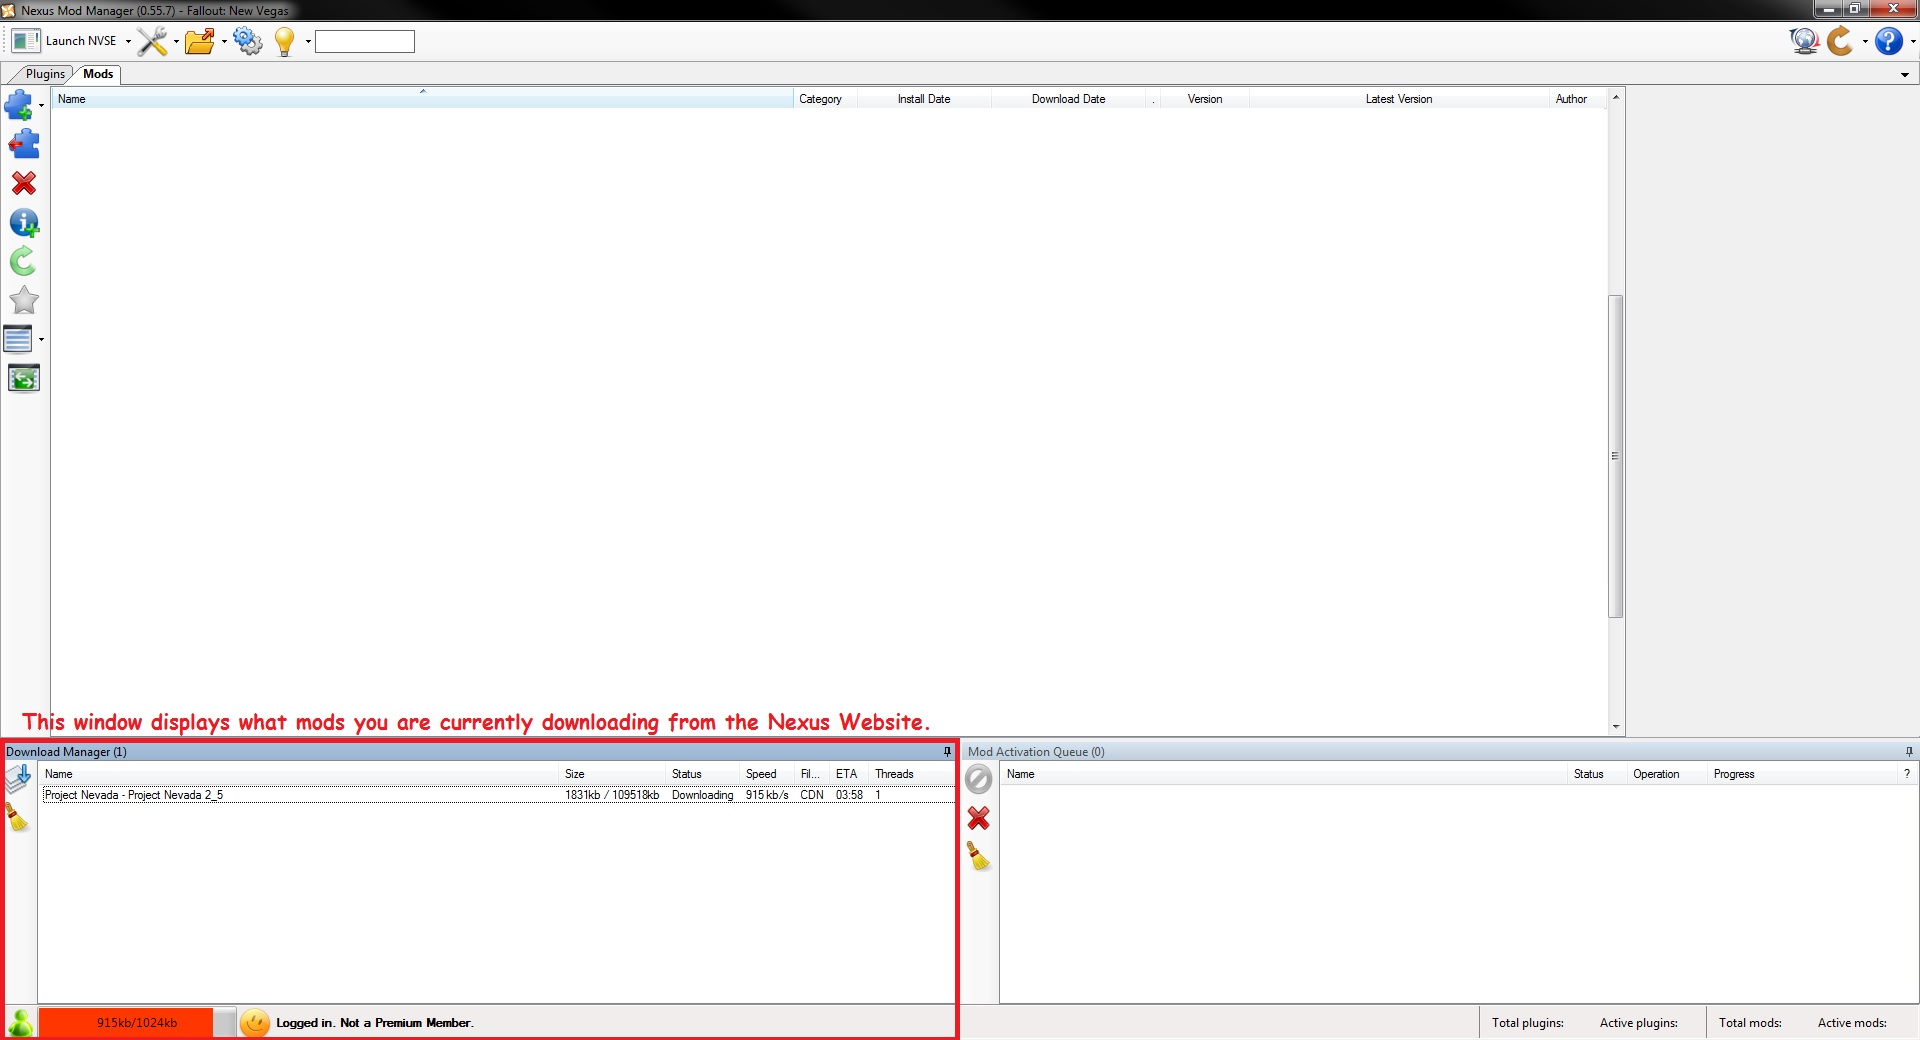 nexus mod manager plugins not working